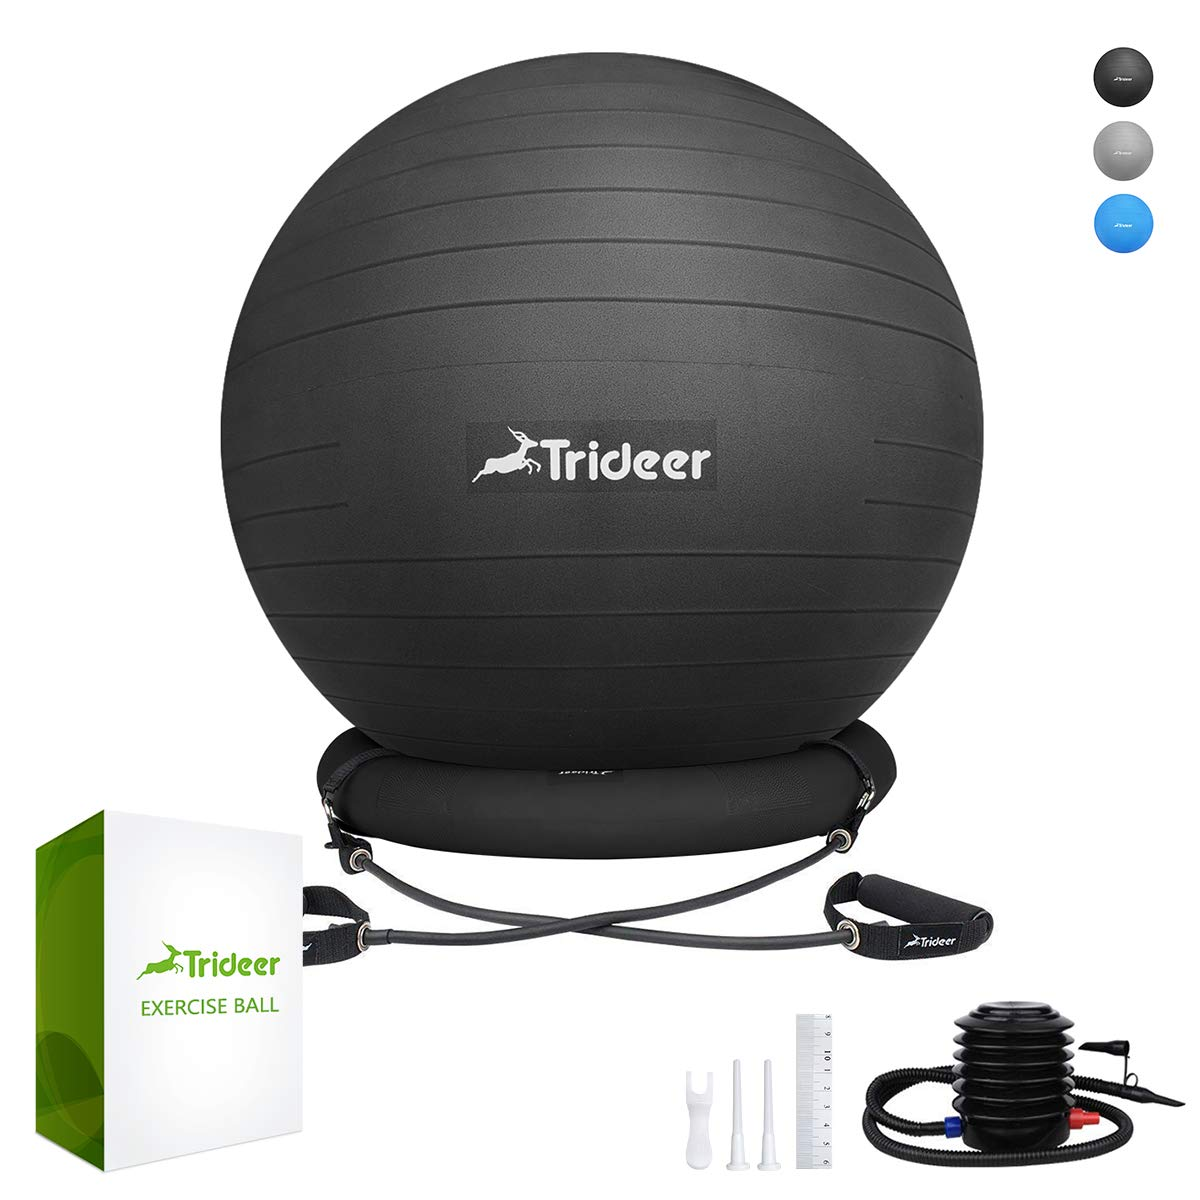 Trideer Exercise Ball Chair, 65cm Stability Yoga